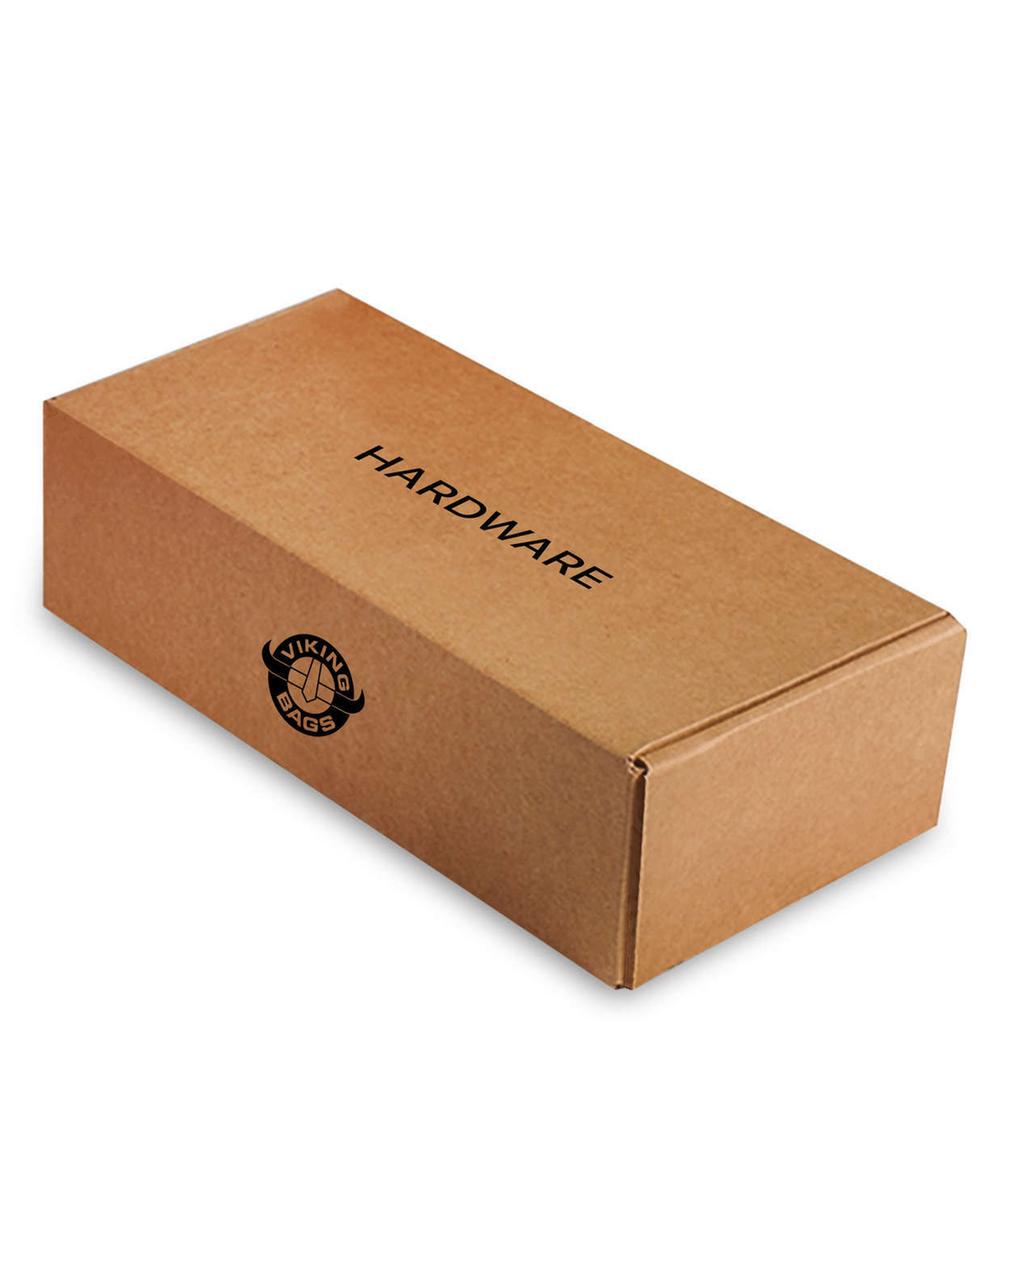 Honda 750 Shadow Spirit DC Charger Braided Motorcycle Saddlebags Hardware Box